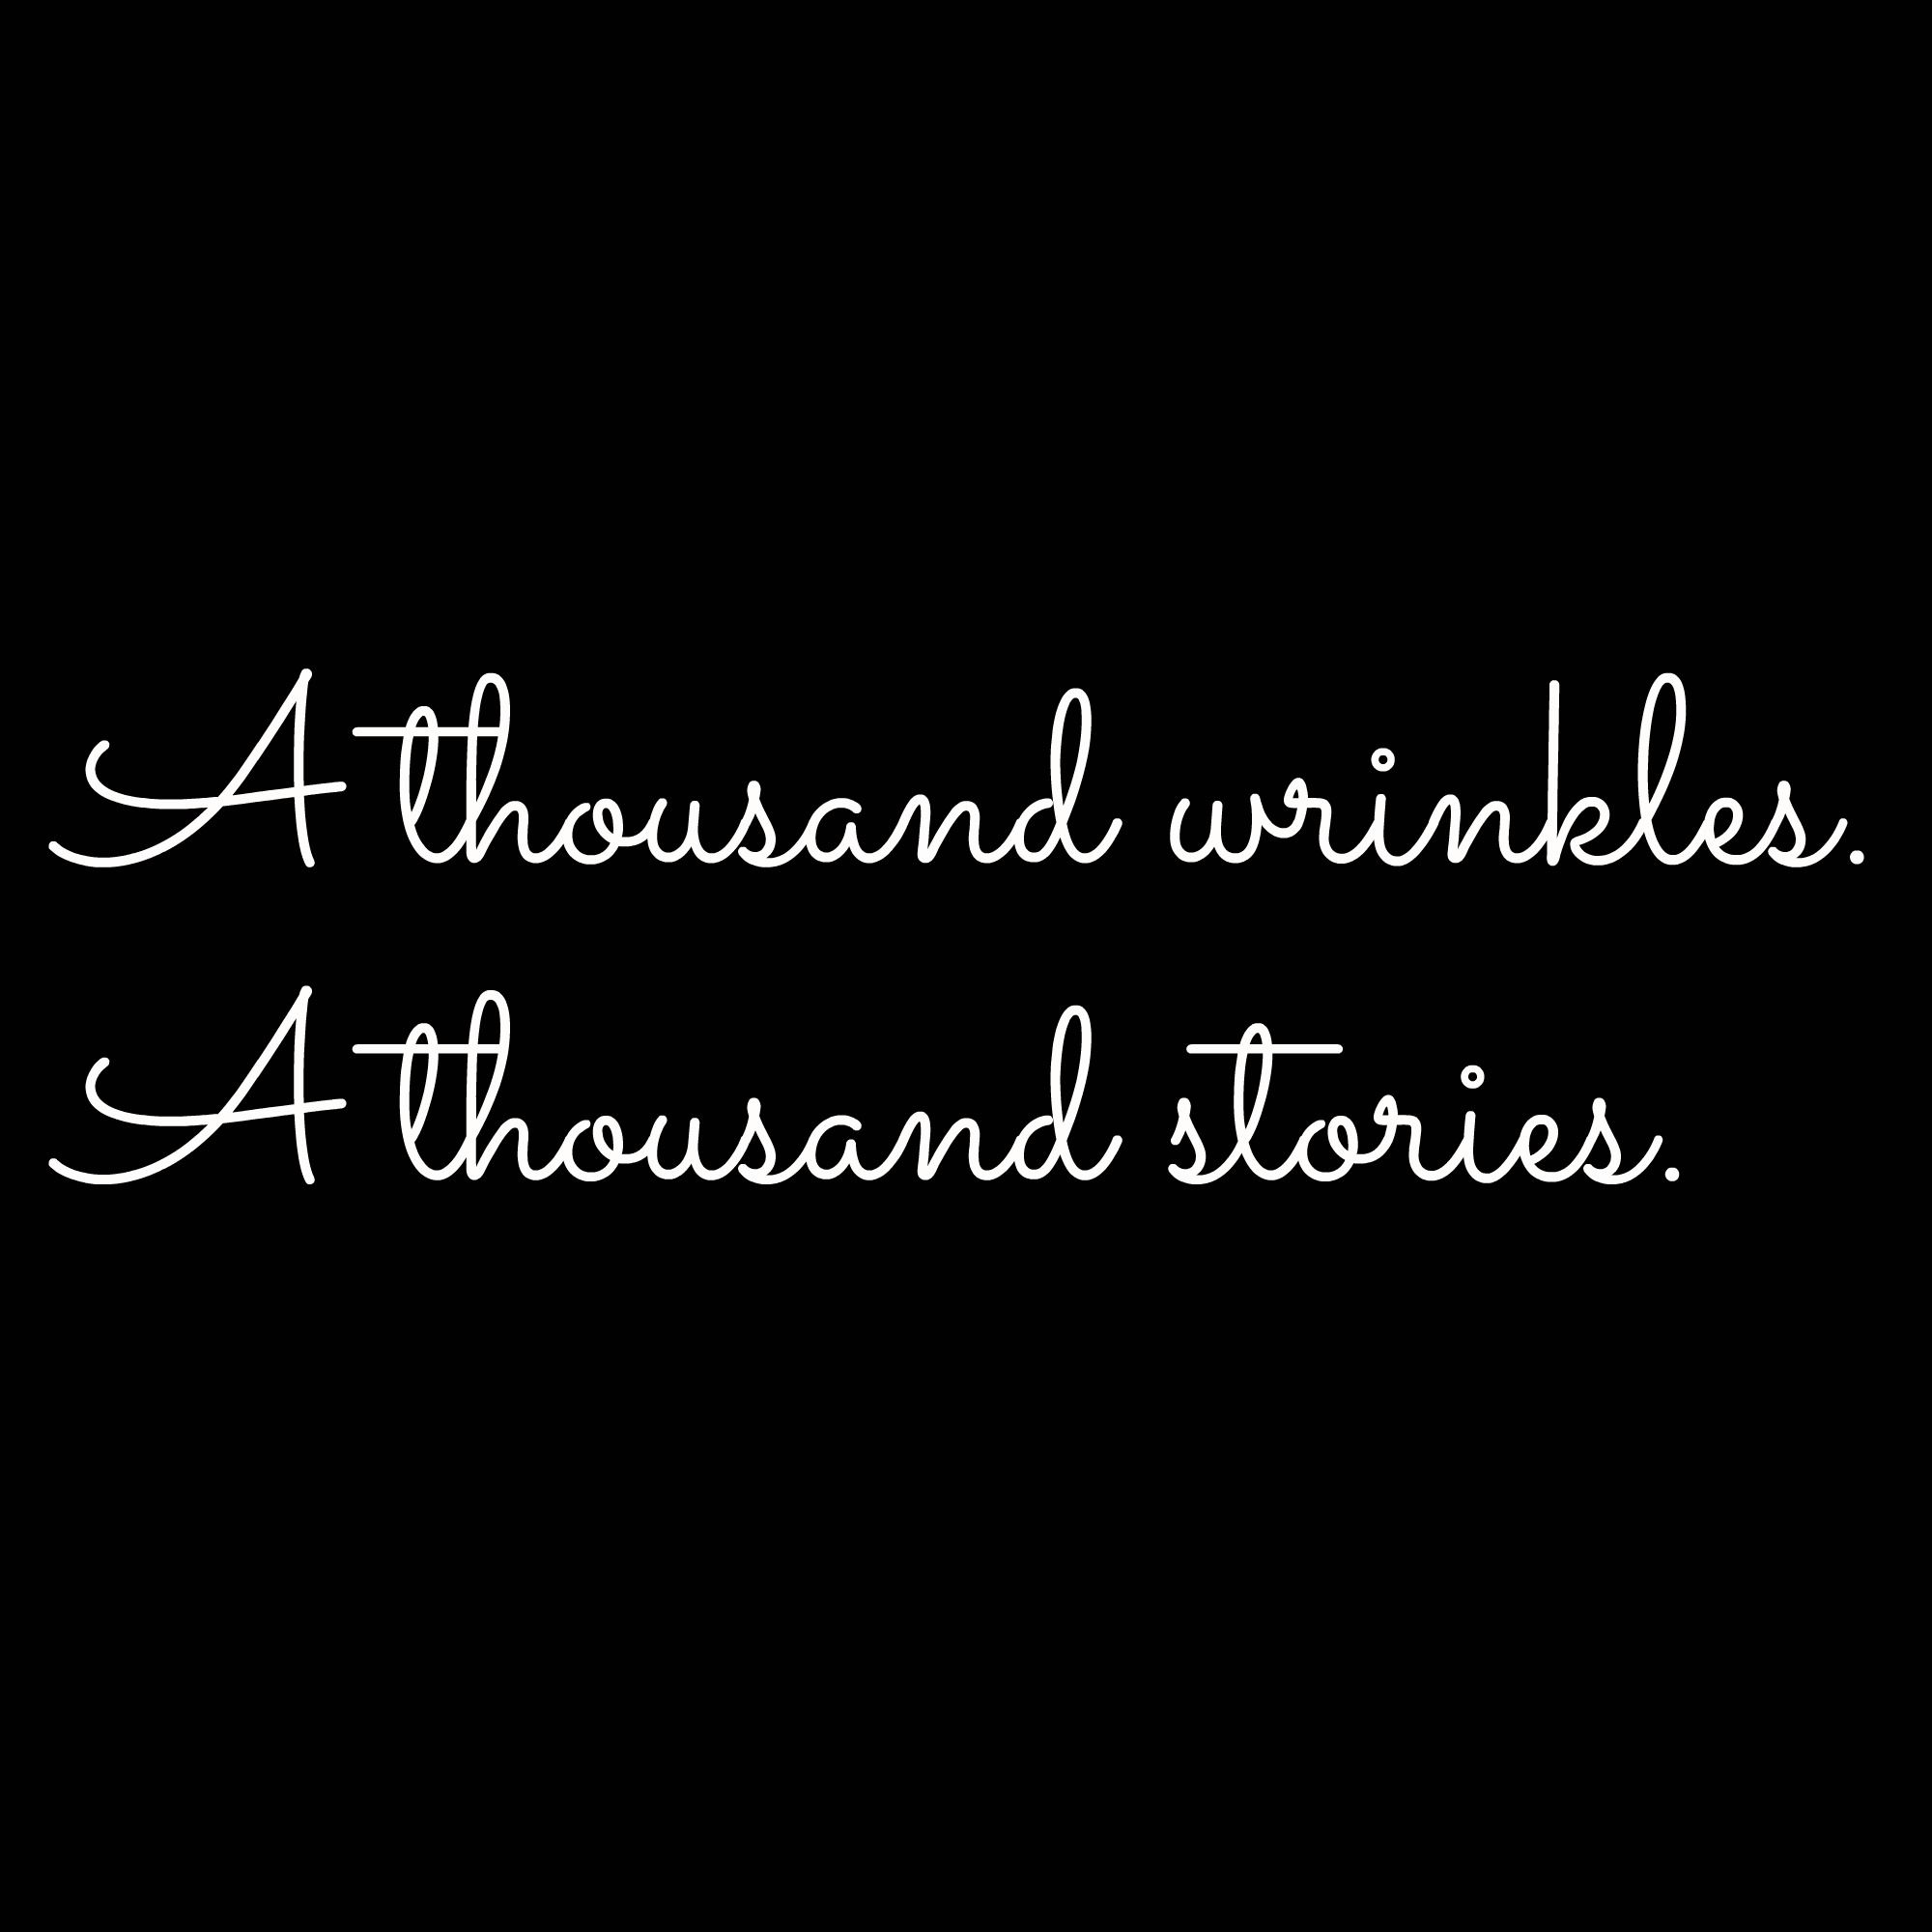 Six Word Memoirs Back To School Pinterest Memoirs Poem And